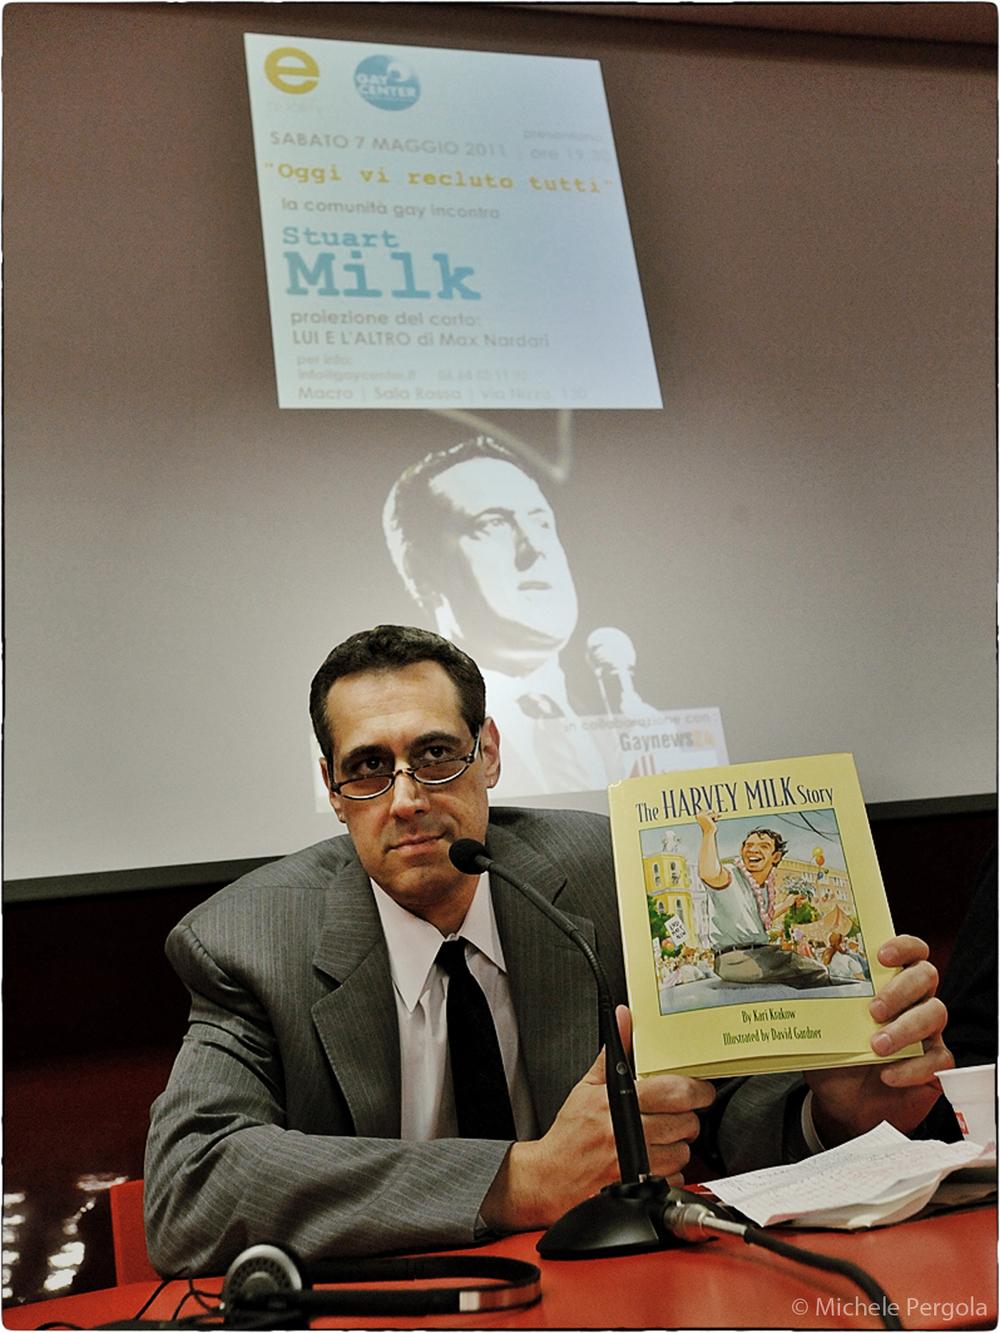 Stuart Milk (Rome, Italy 2011)